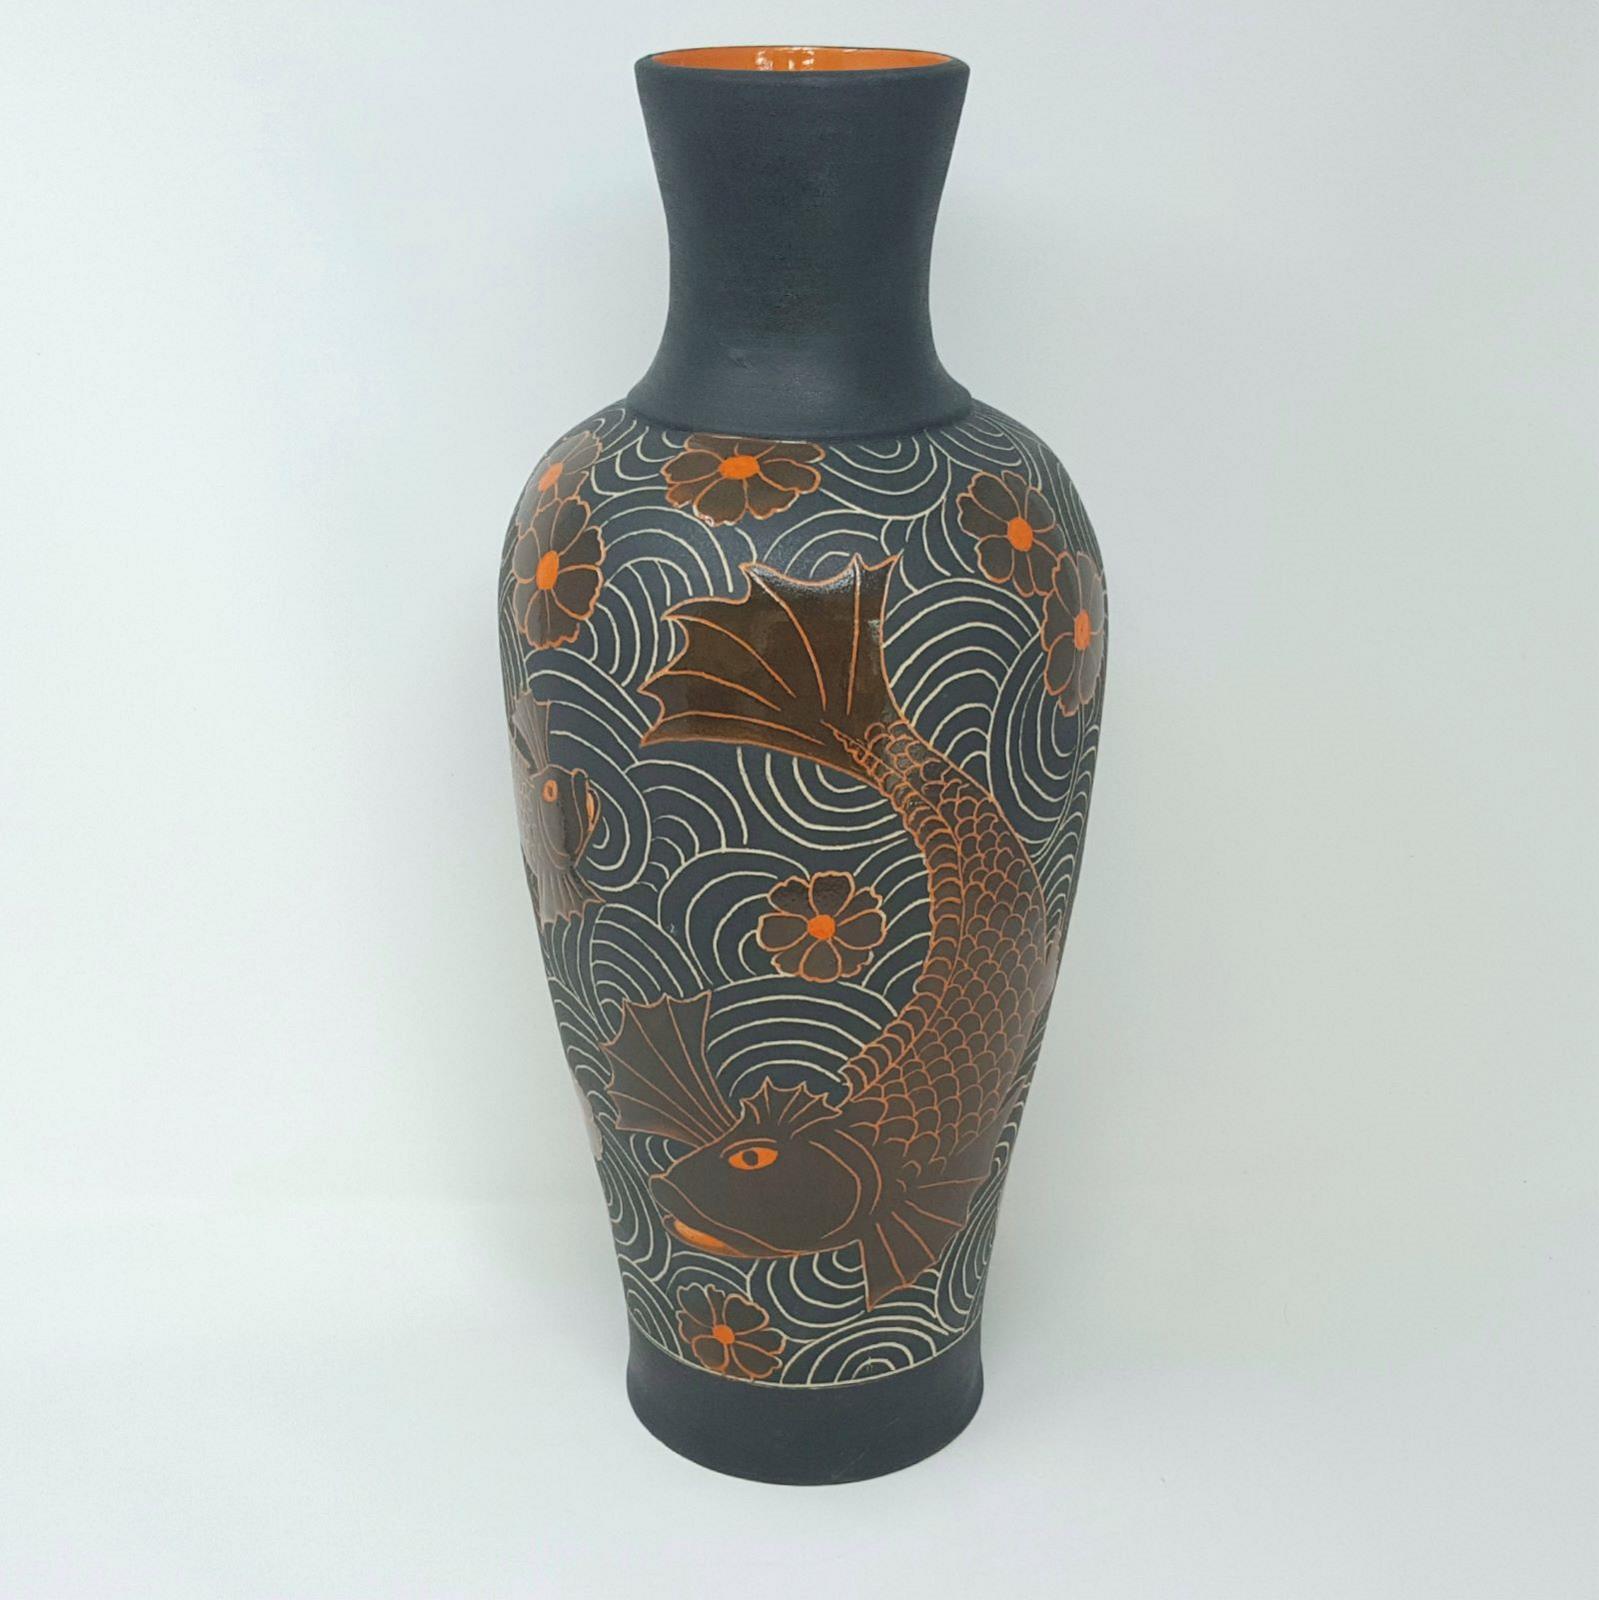 Tall Black Vase with Orange Fighting Fish